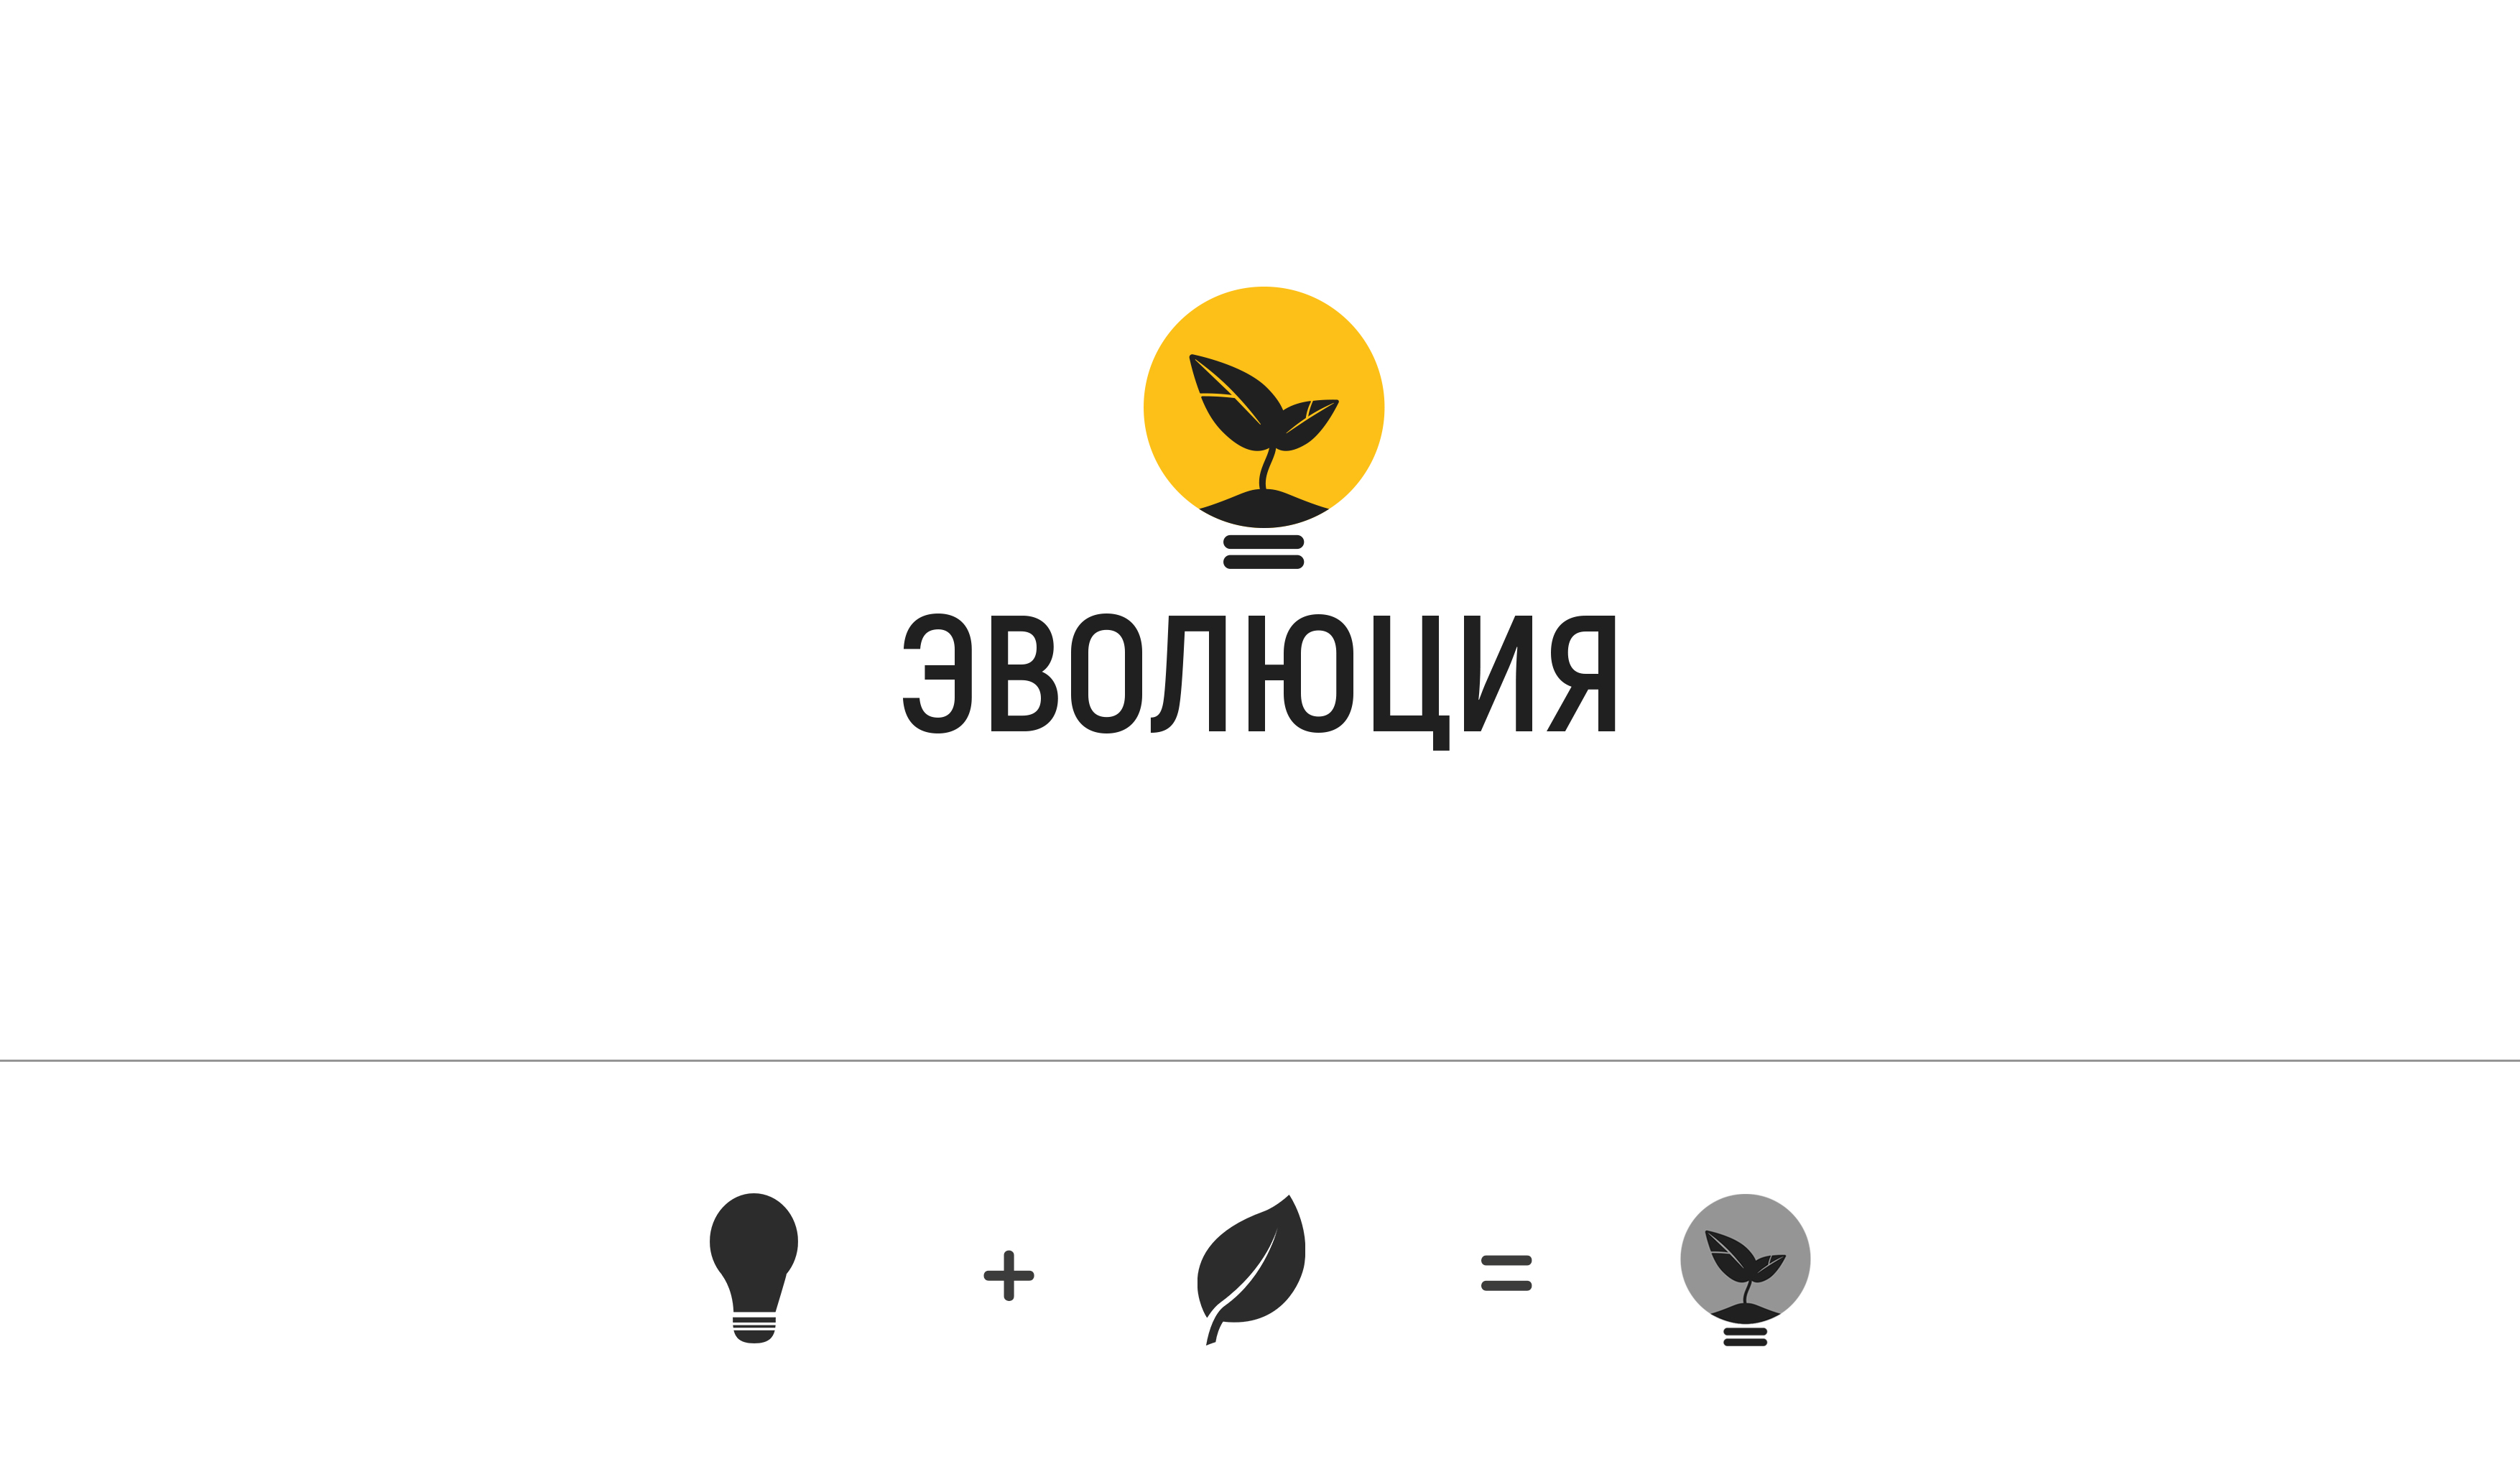 Разработать логотип для Онлайн-школы и сообщества фото f_5625bc6463b3b734.jpg